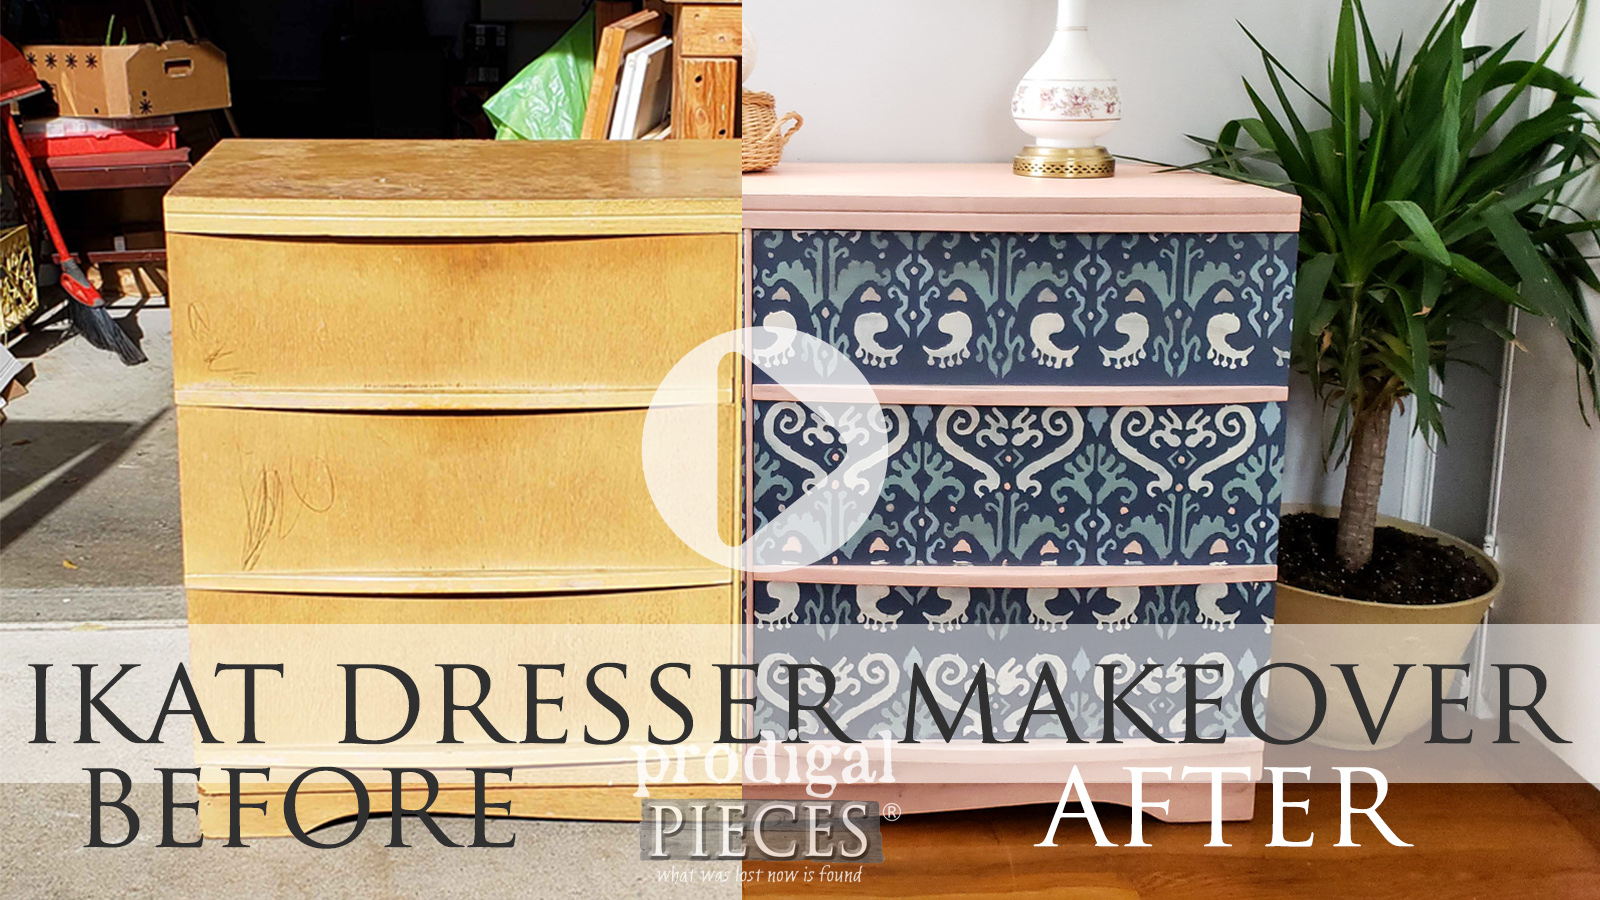 DIY Video Tutorial for an Ikat Dresser Makeover by Larissa of Prodigal Pieces | prodigalpieces.com #prodigalpieces